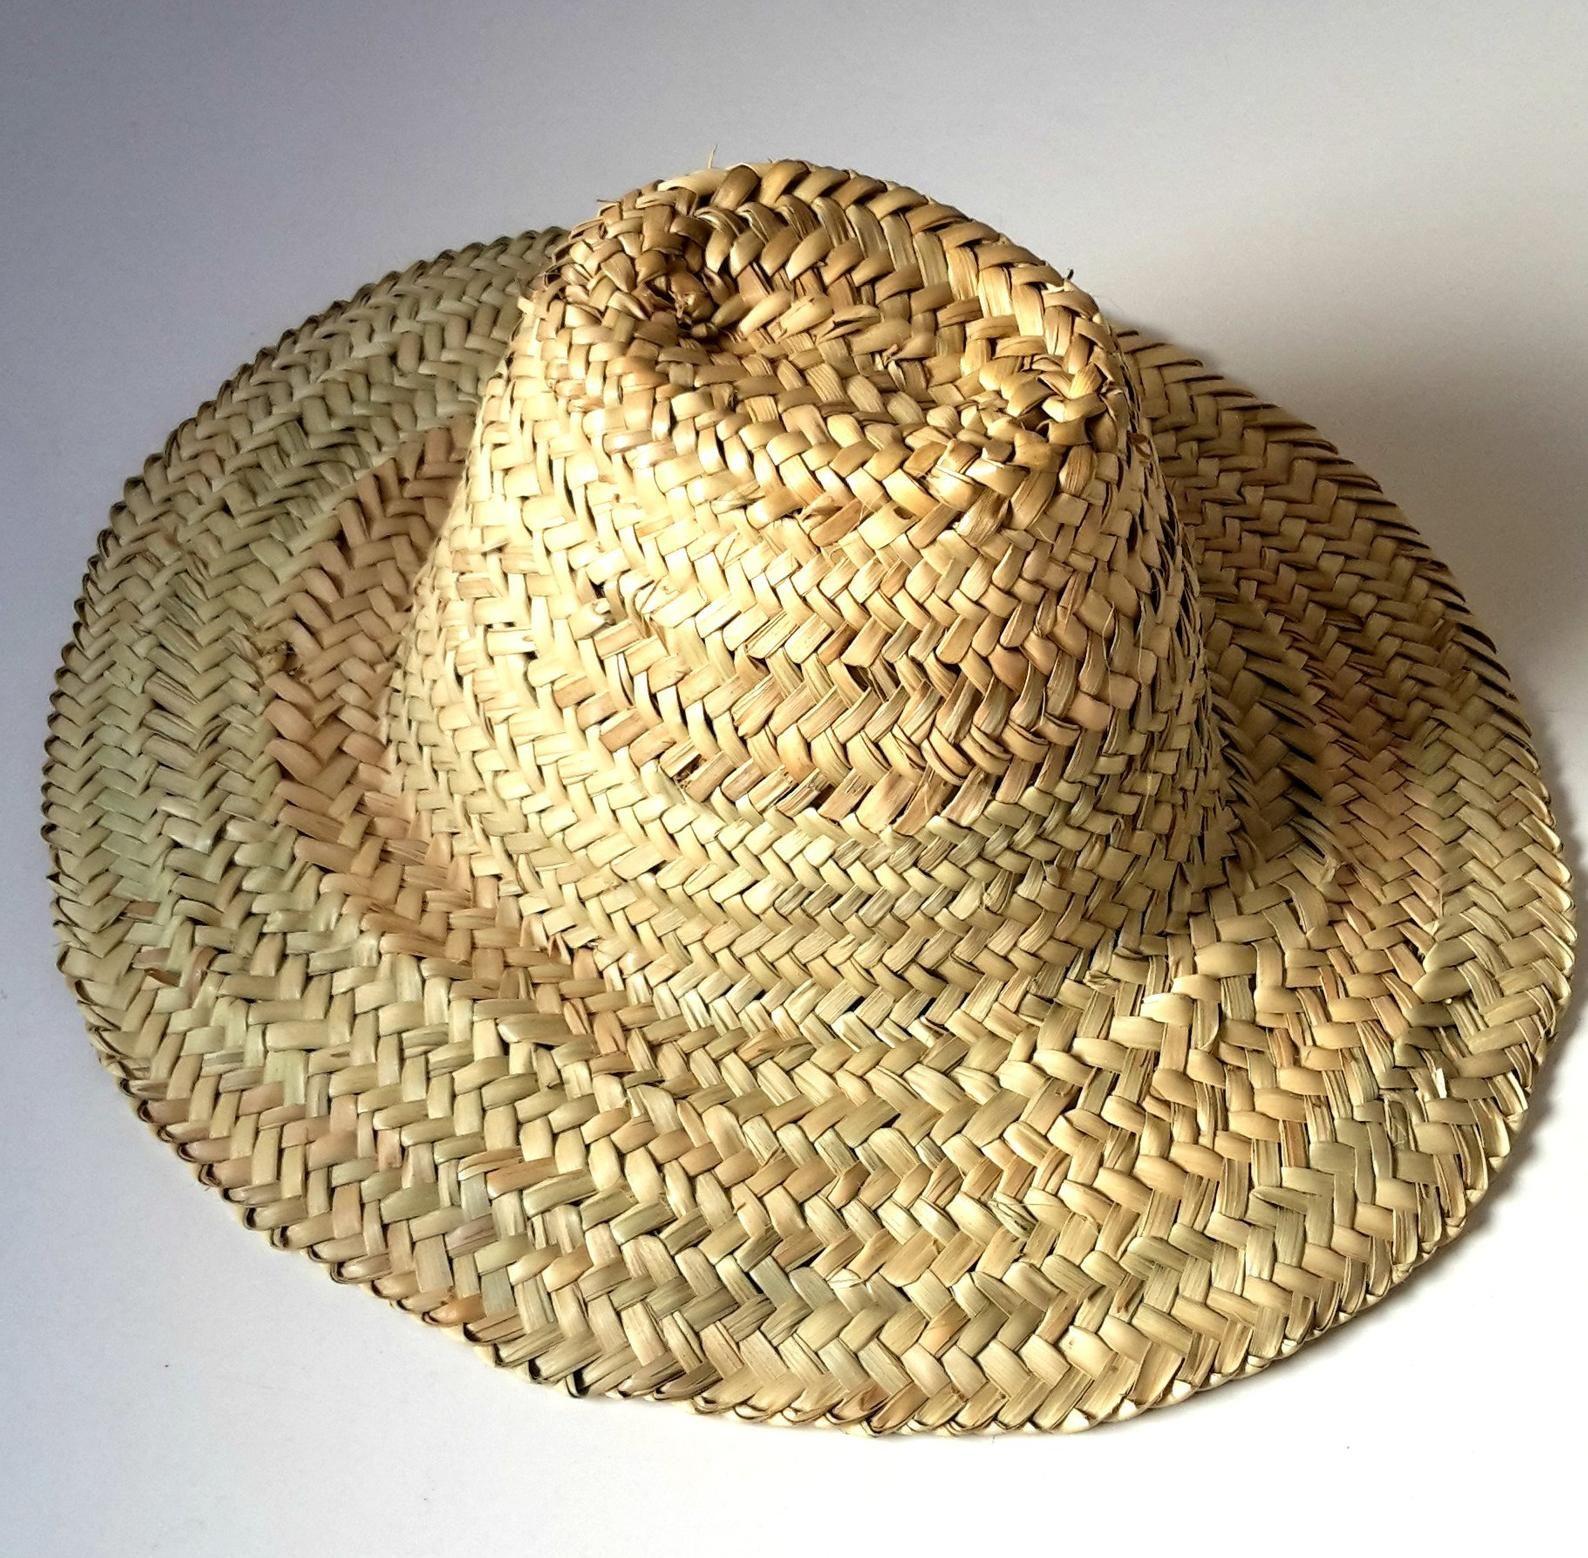 MOD Woman/'s White Woven HatWhite 60/'s Woven Pillbox Hat